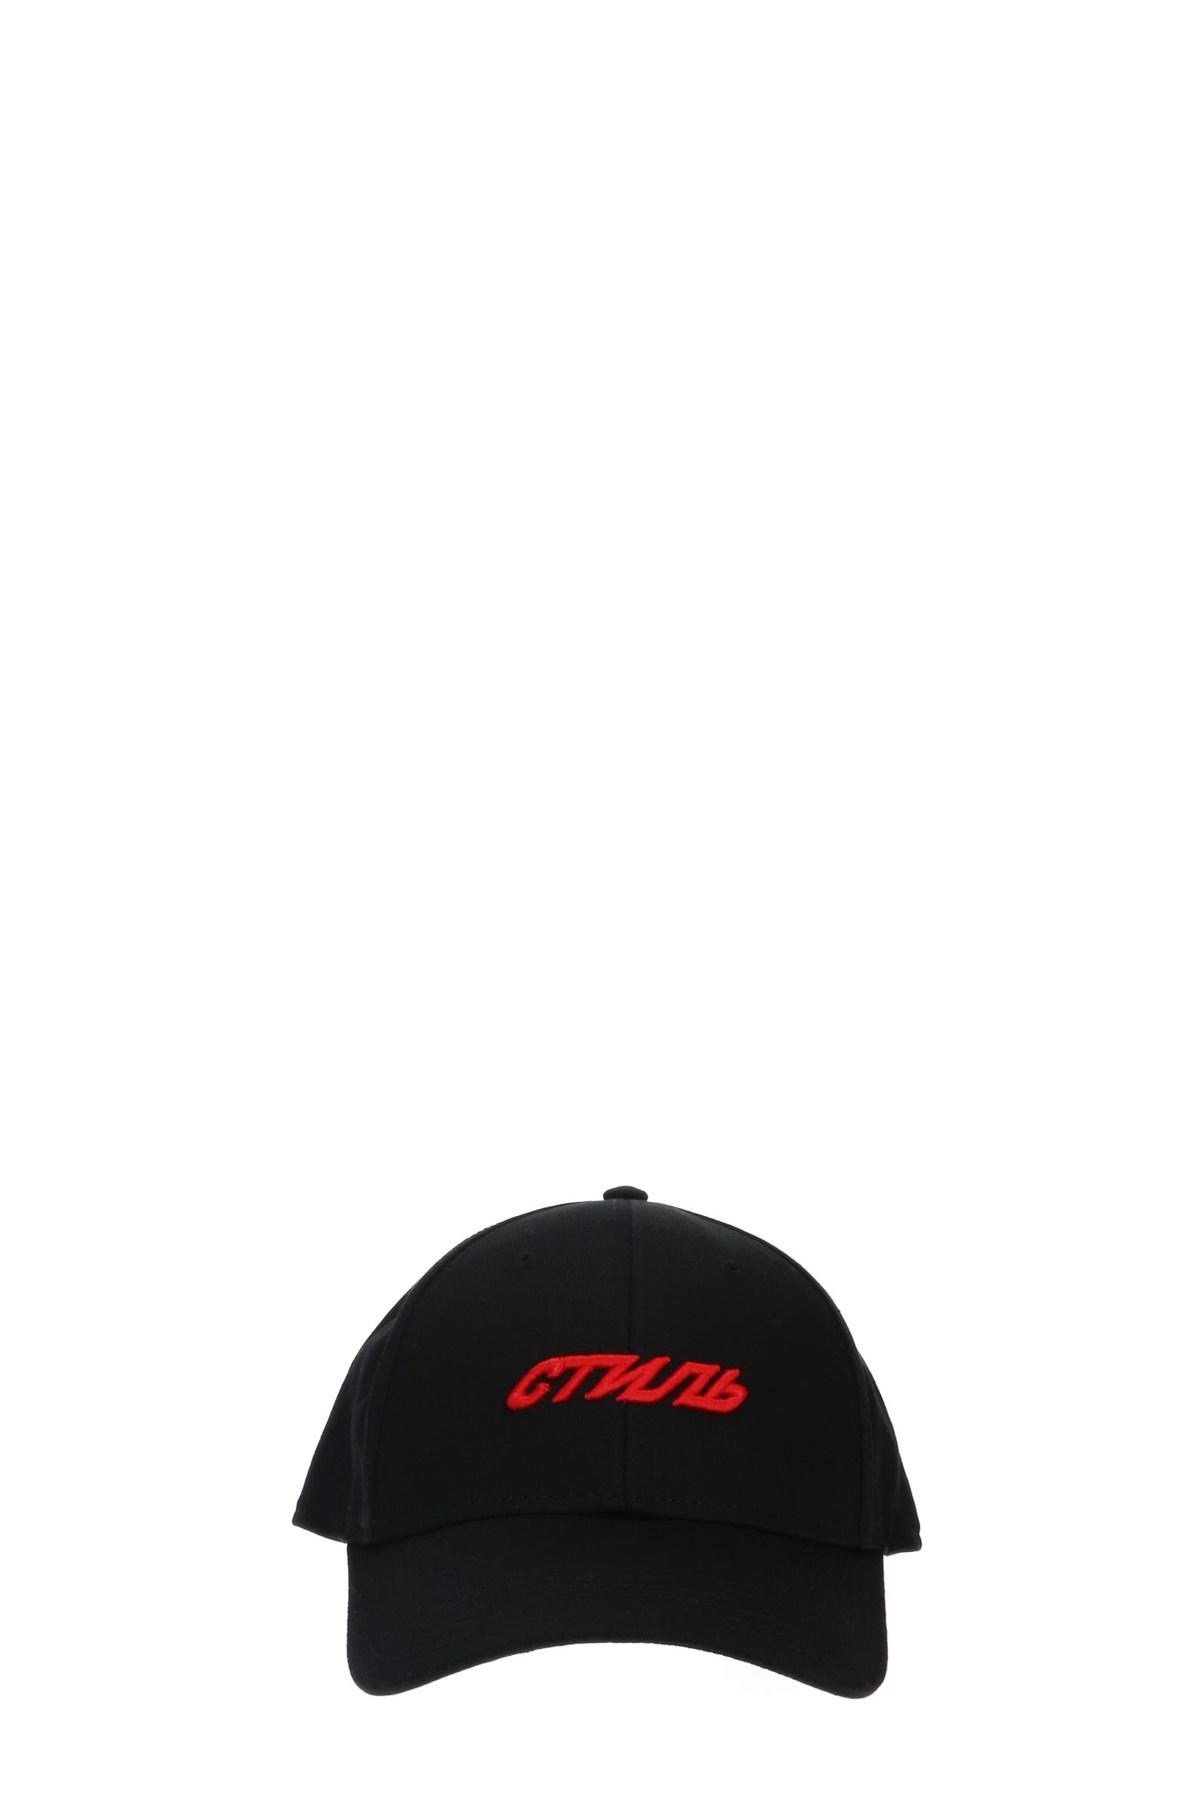 heron preston  Ctnmb  cap available on julian-fashion.com - 62921 1ac1fd521c6